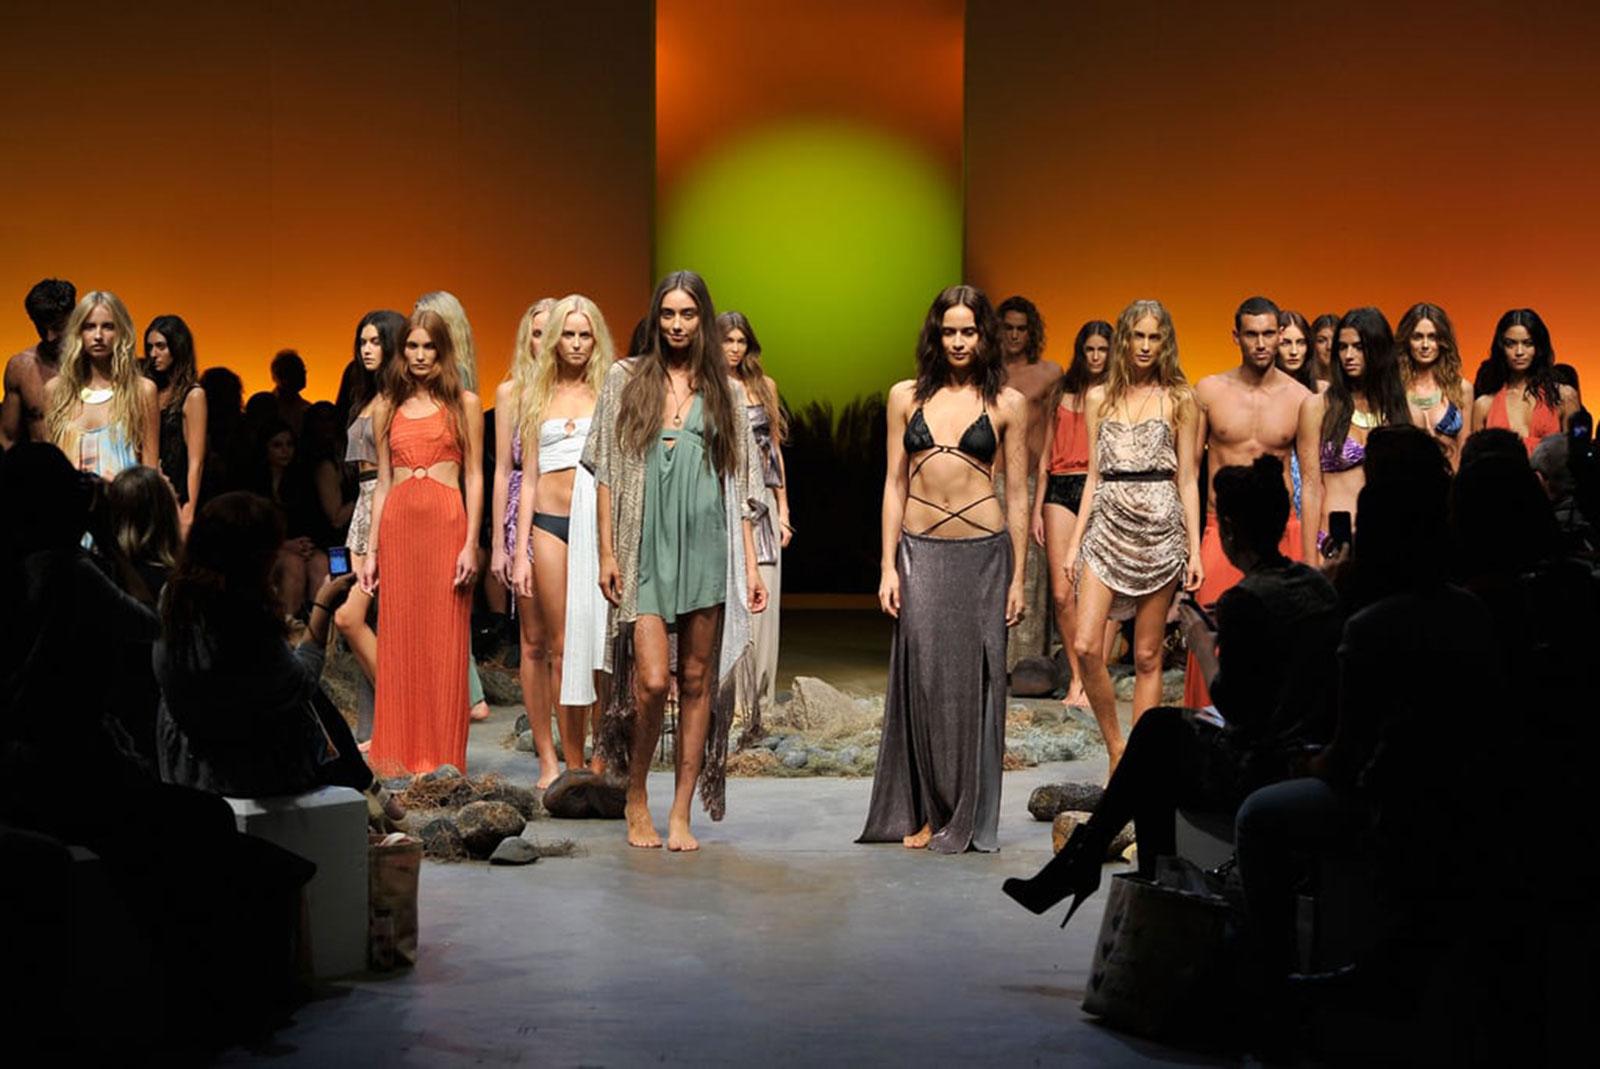 The_Ink_Collecive_Australian_Fashion_2011_35.jpg